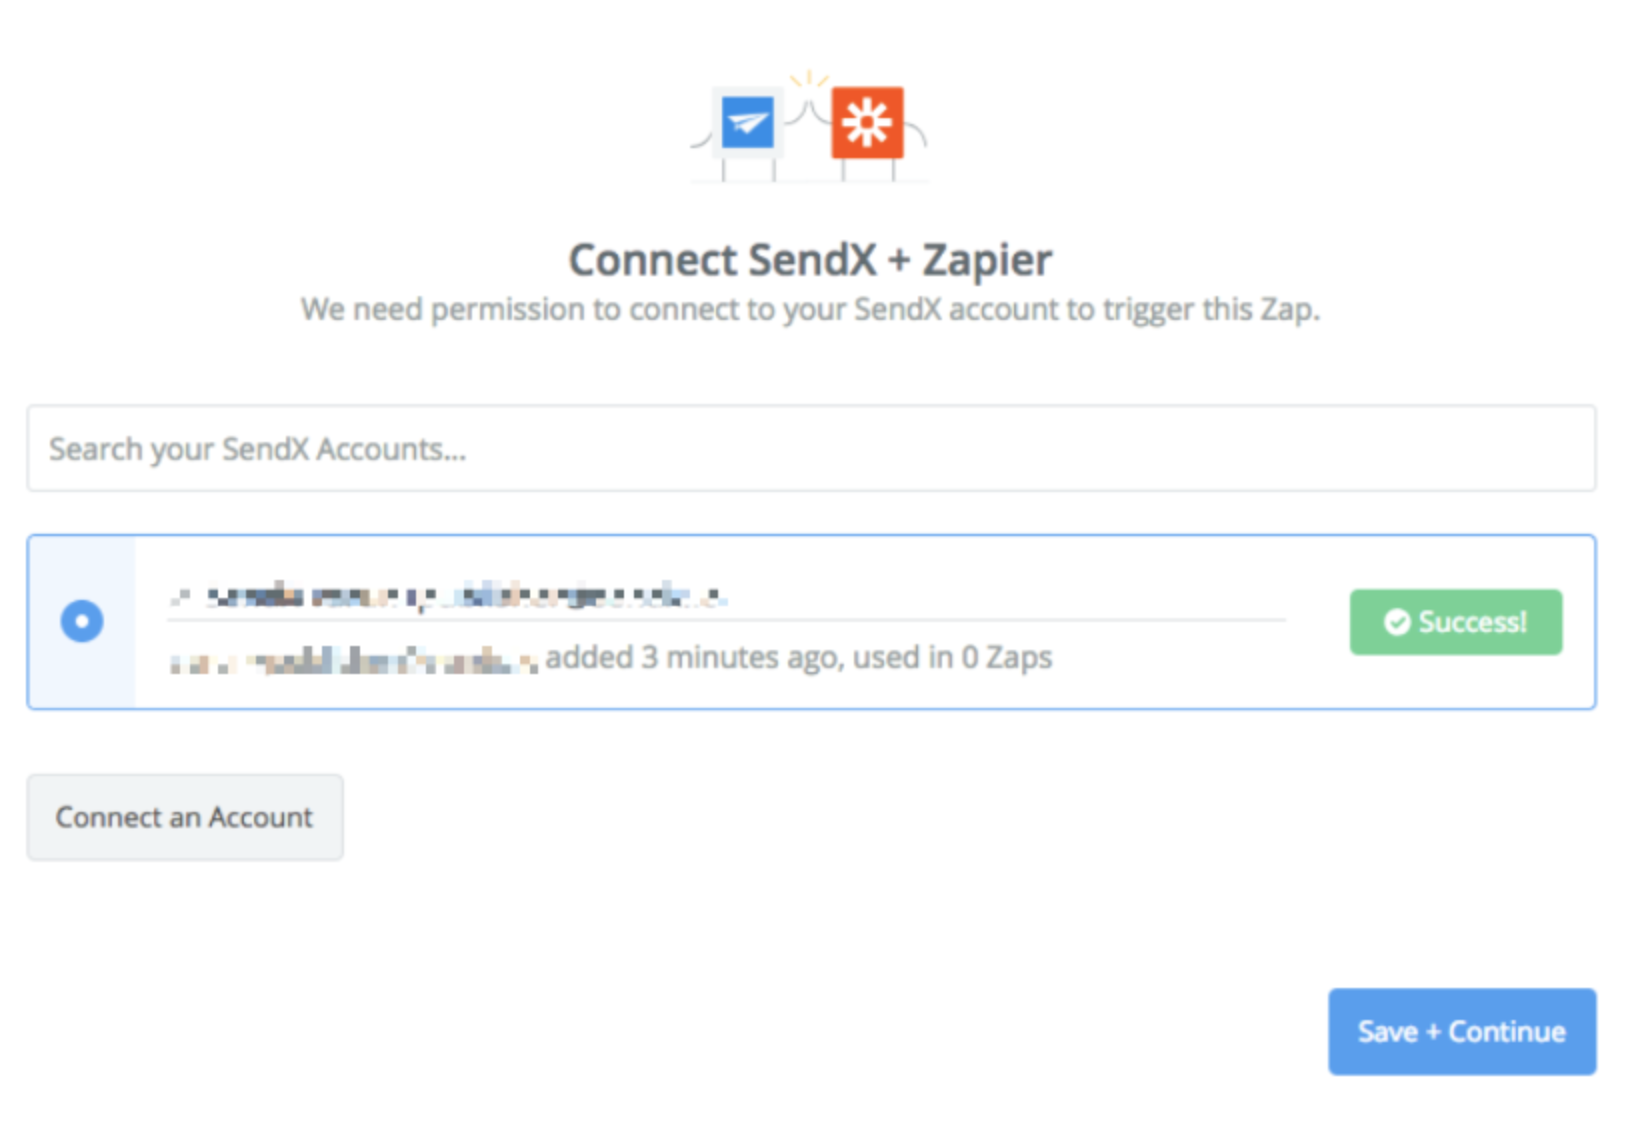 SendX connection successful